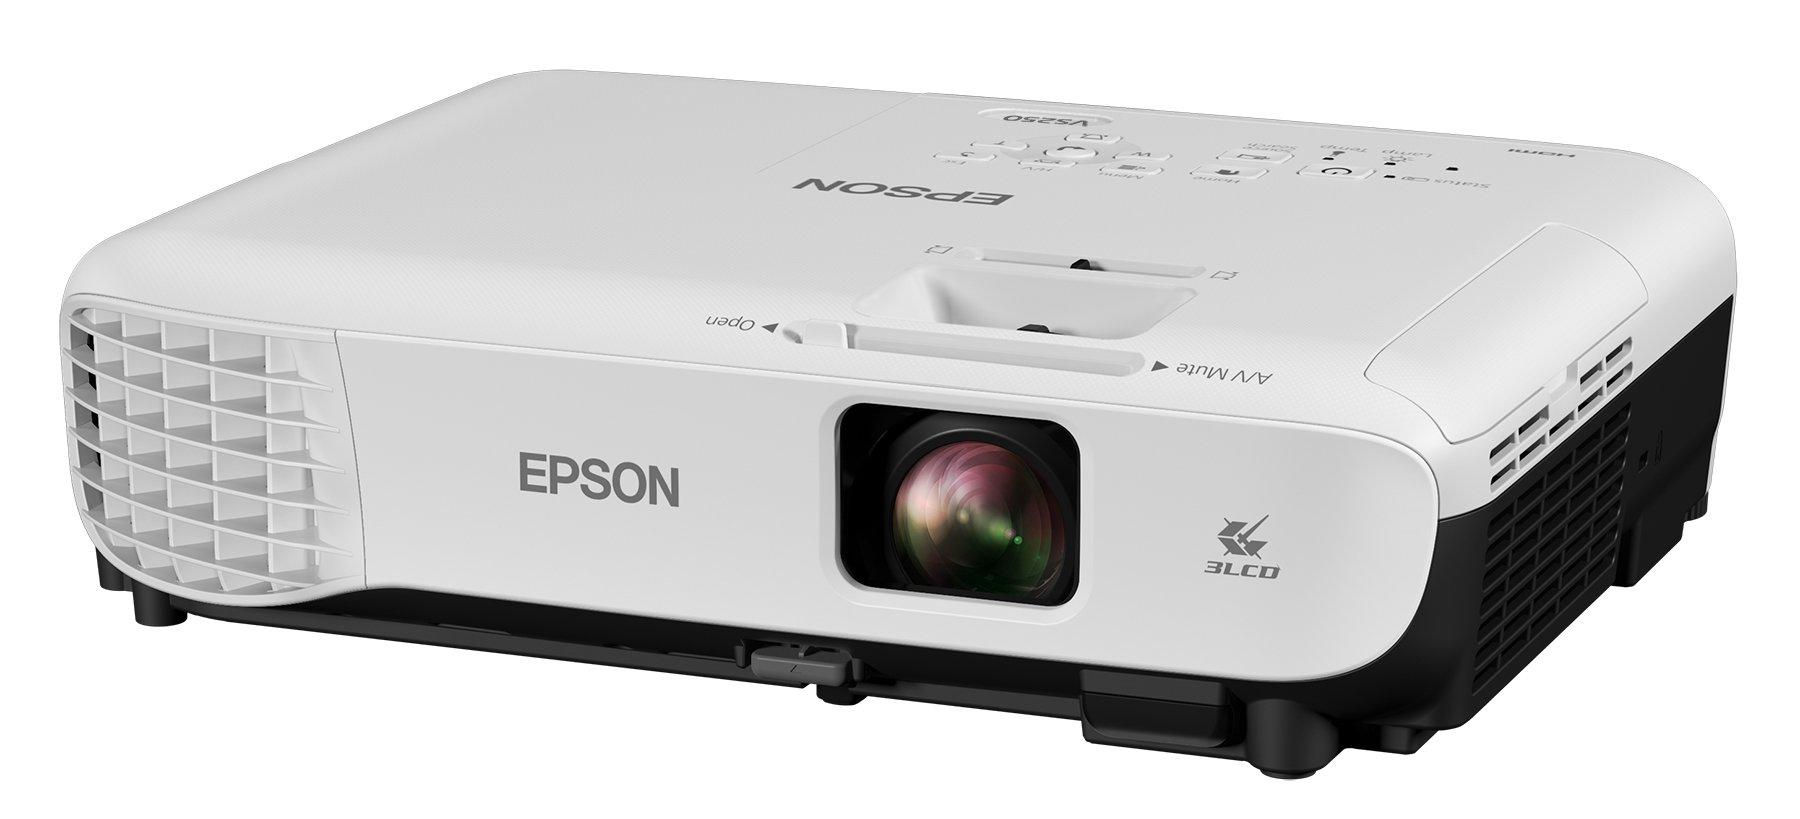 Epson VS250 lumens brightness projector